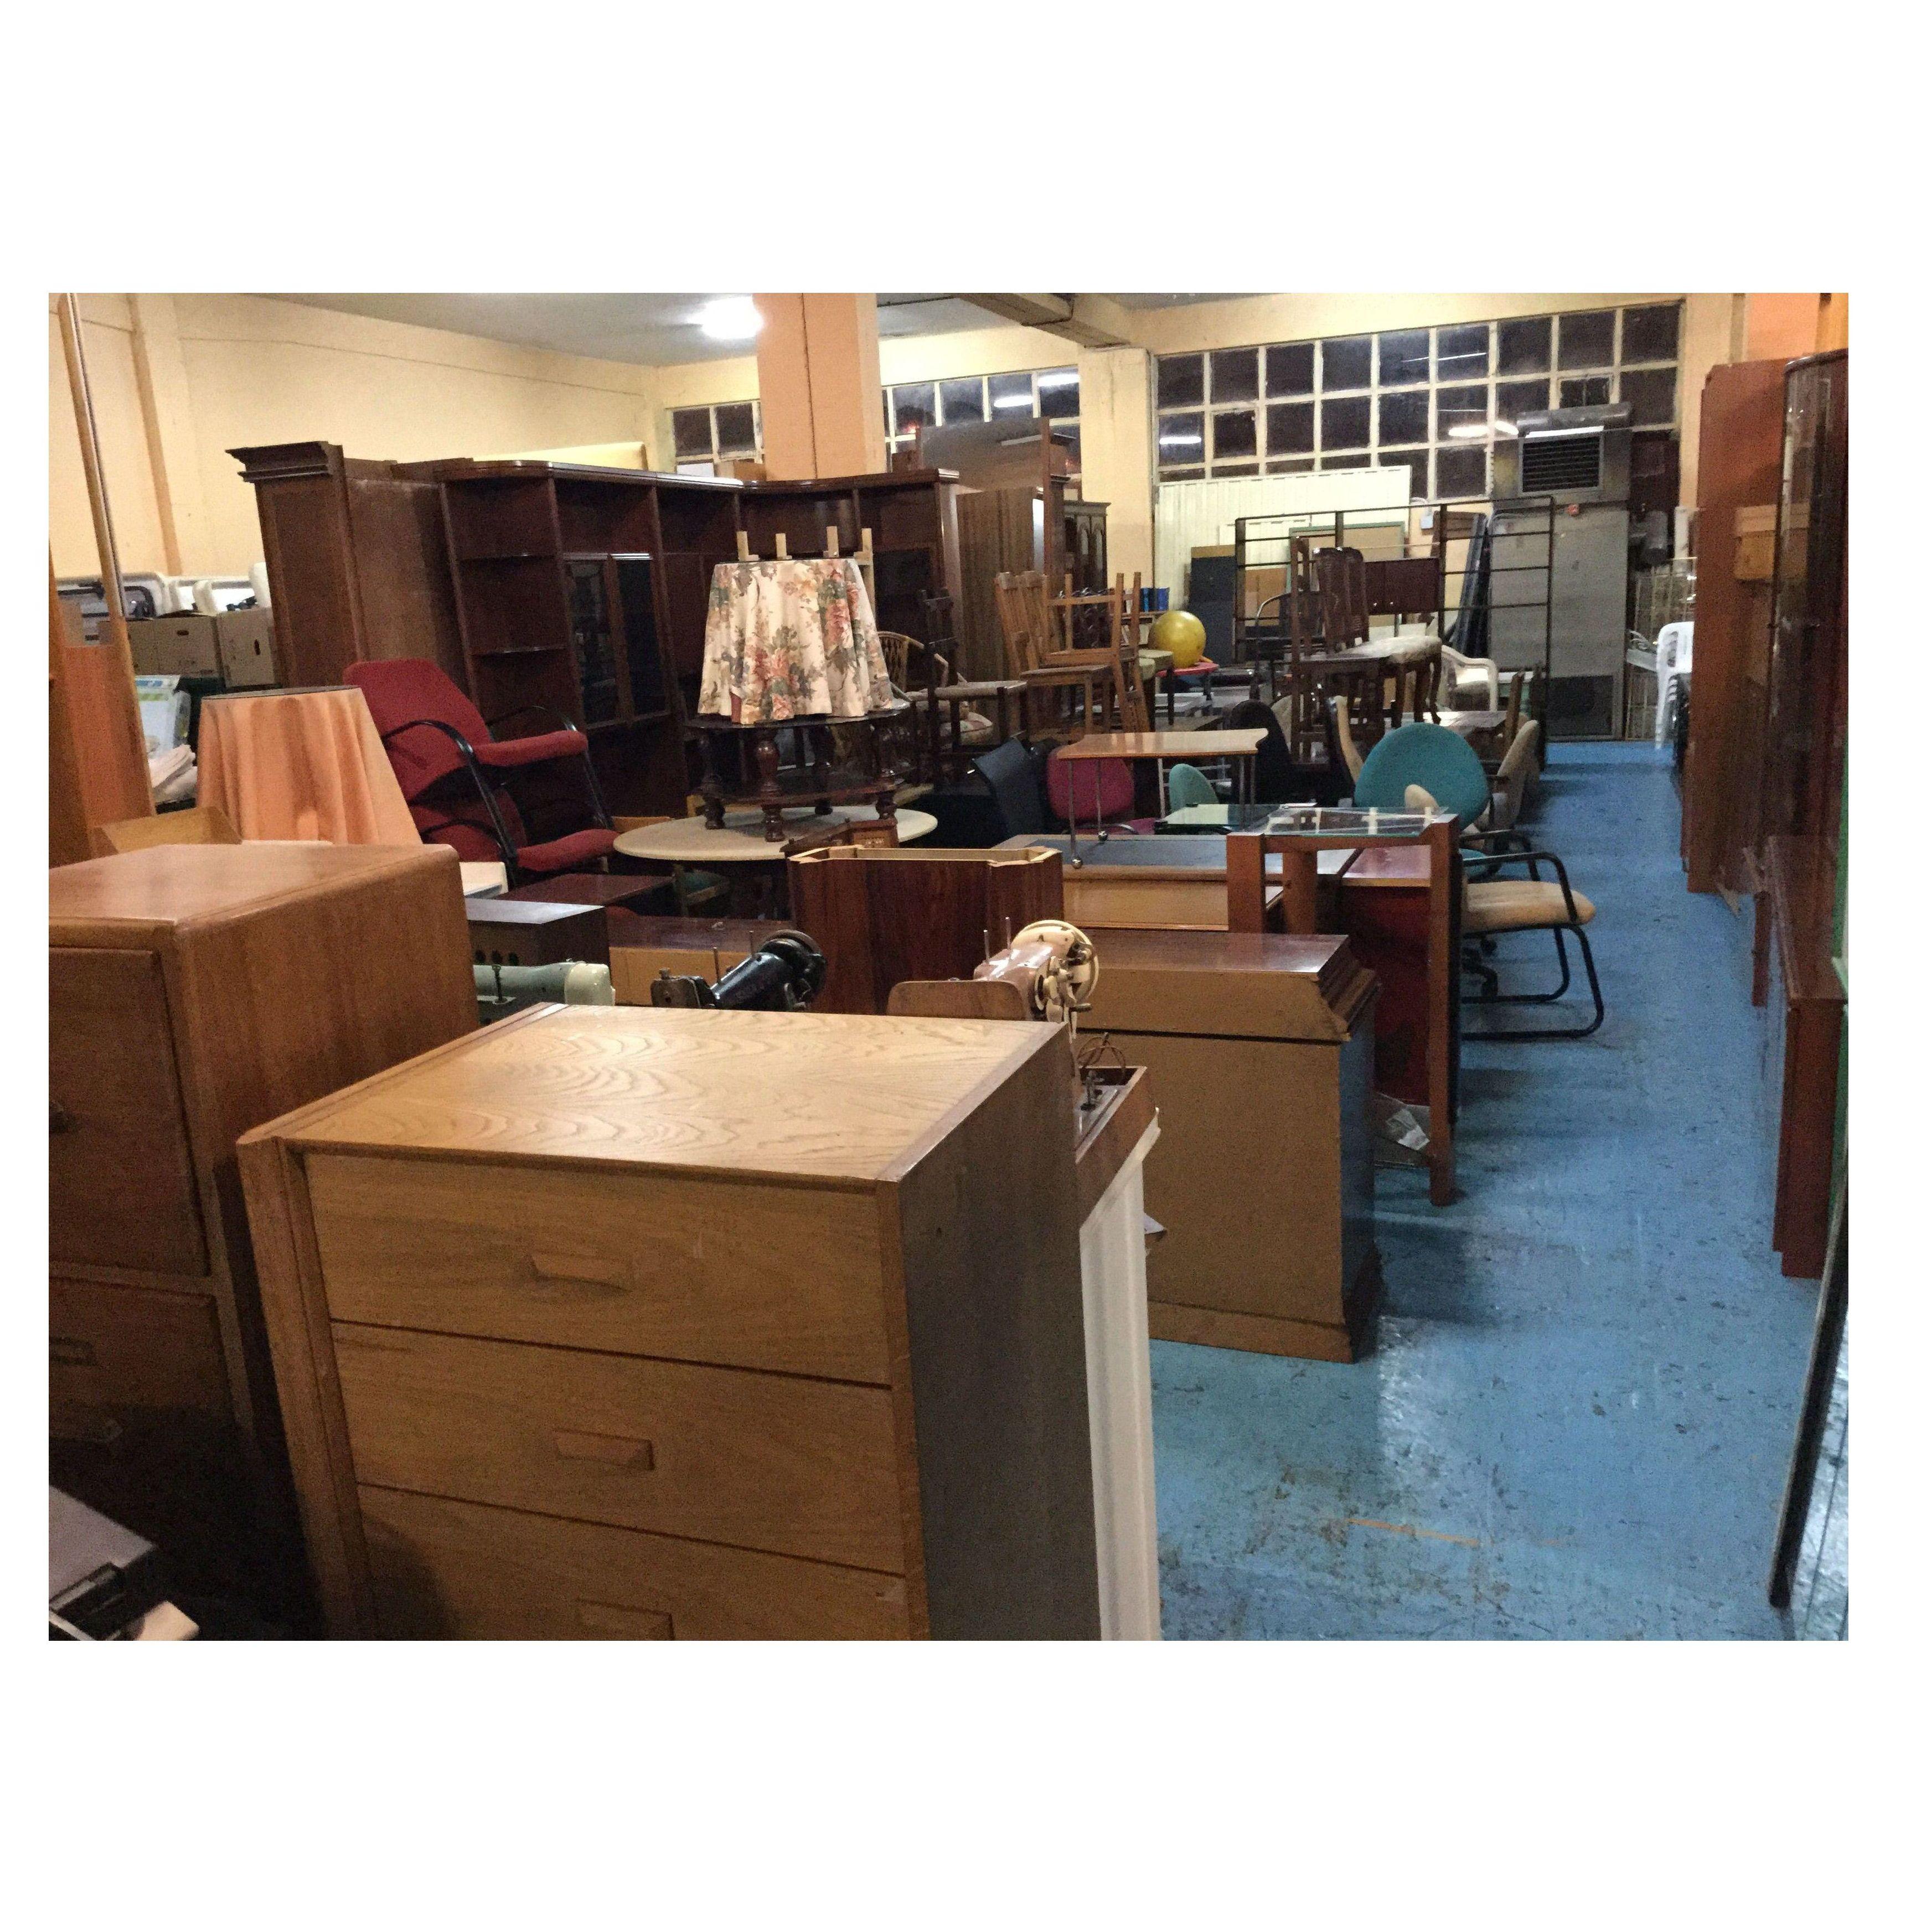 Muebles rastro reto obtenga ideas dise o de muebles para - Remar muebles madrid ...